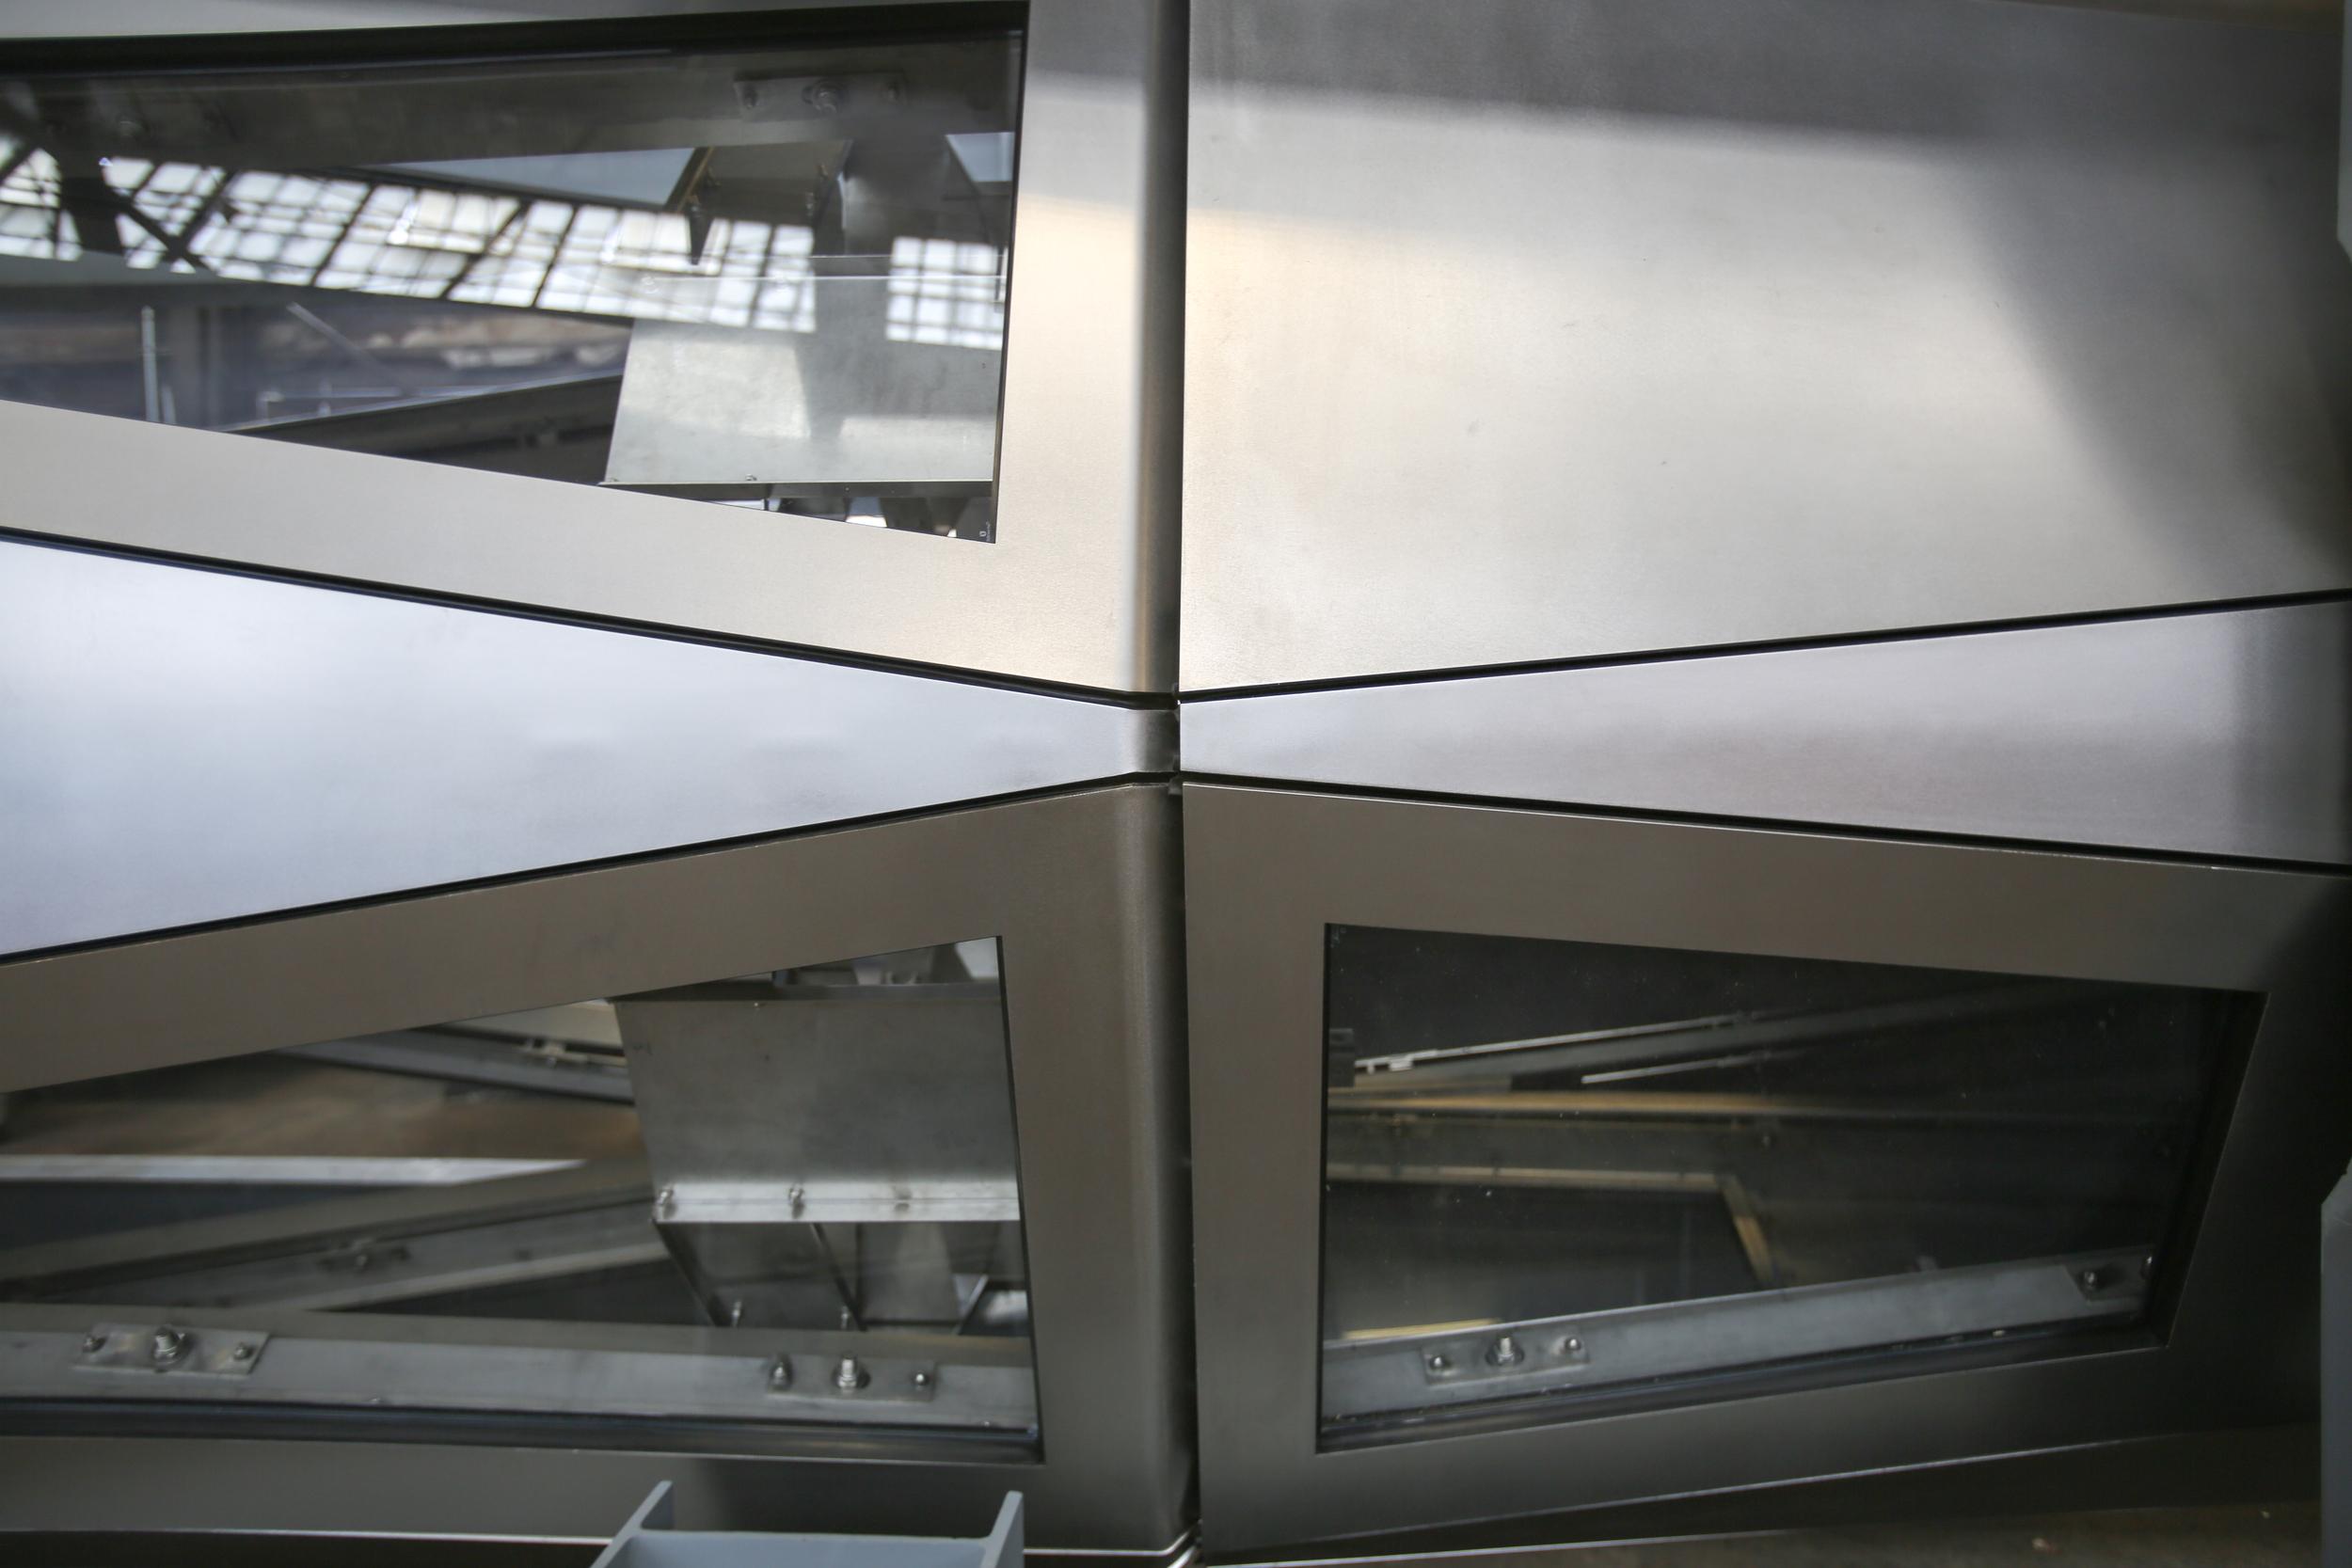 kammetal-1WTC Beacon-343.jpg